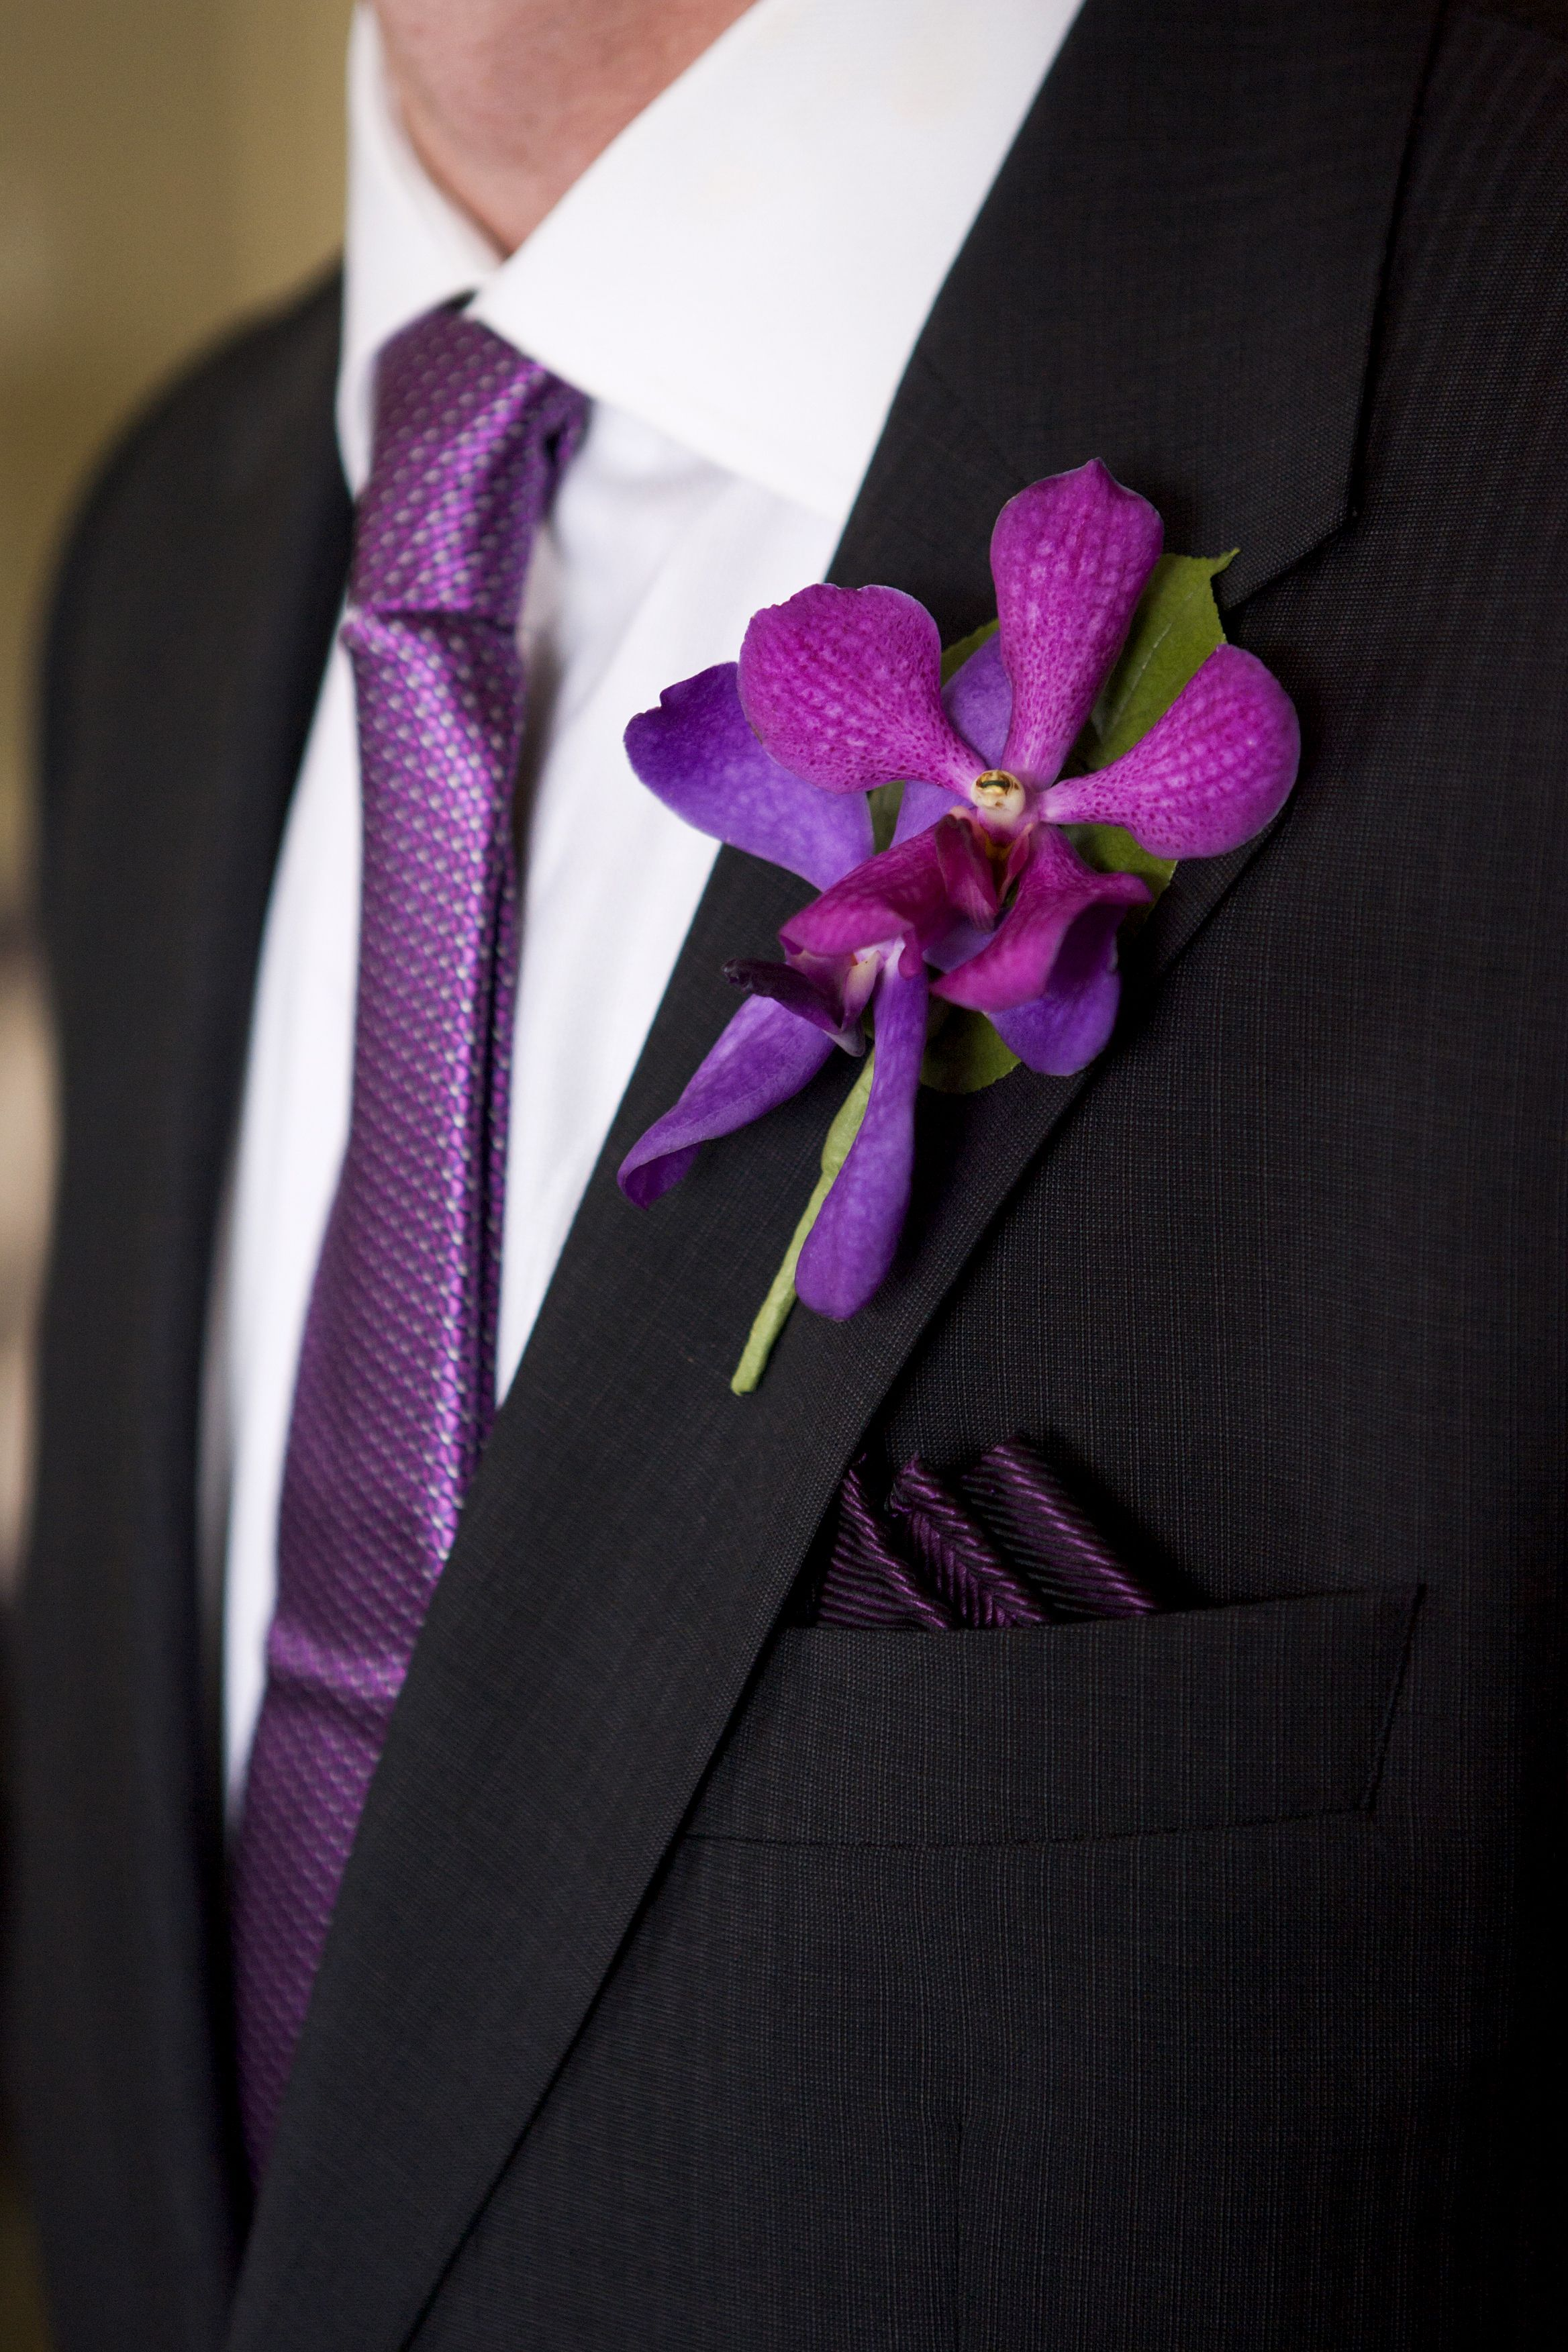 NEW ORCHID BUTTONHOLE MAGENTA PURPLE BRIDE GROOM CORSAGE WEDDING FLOWERS